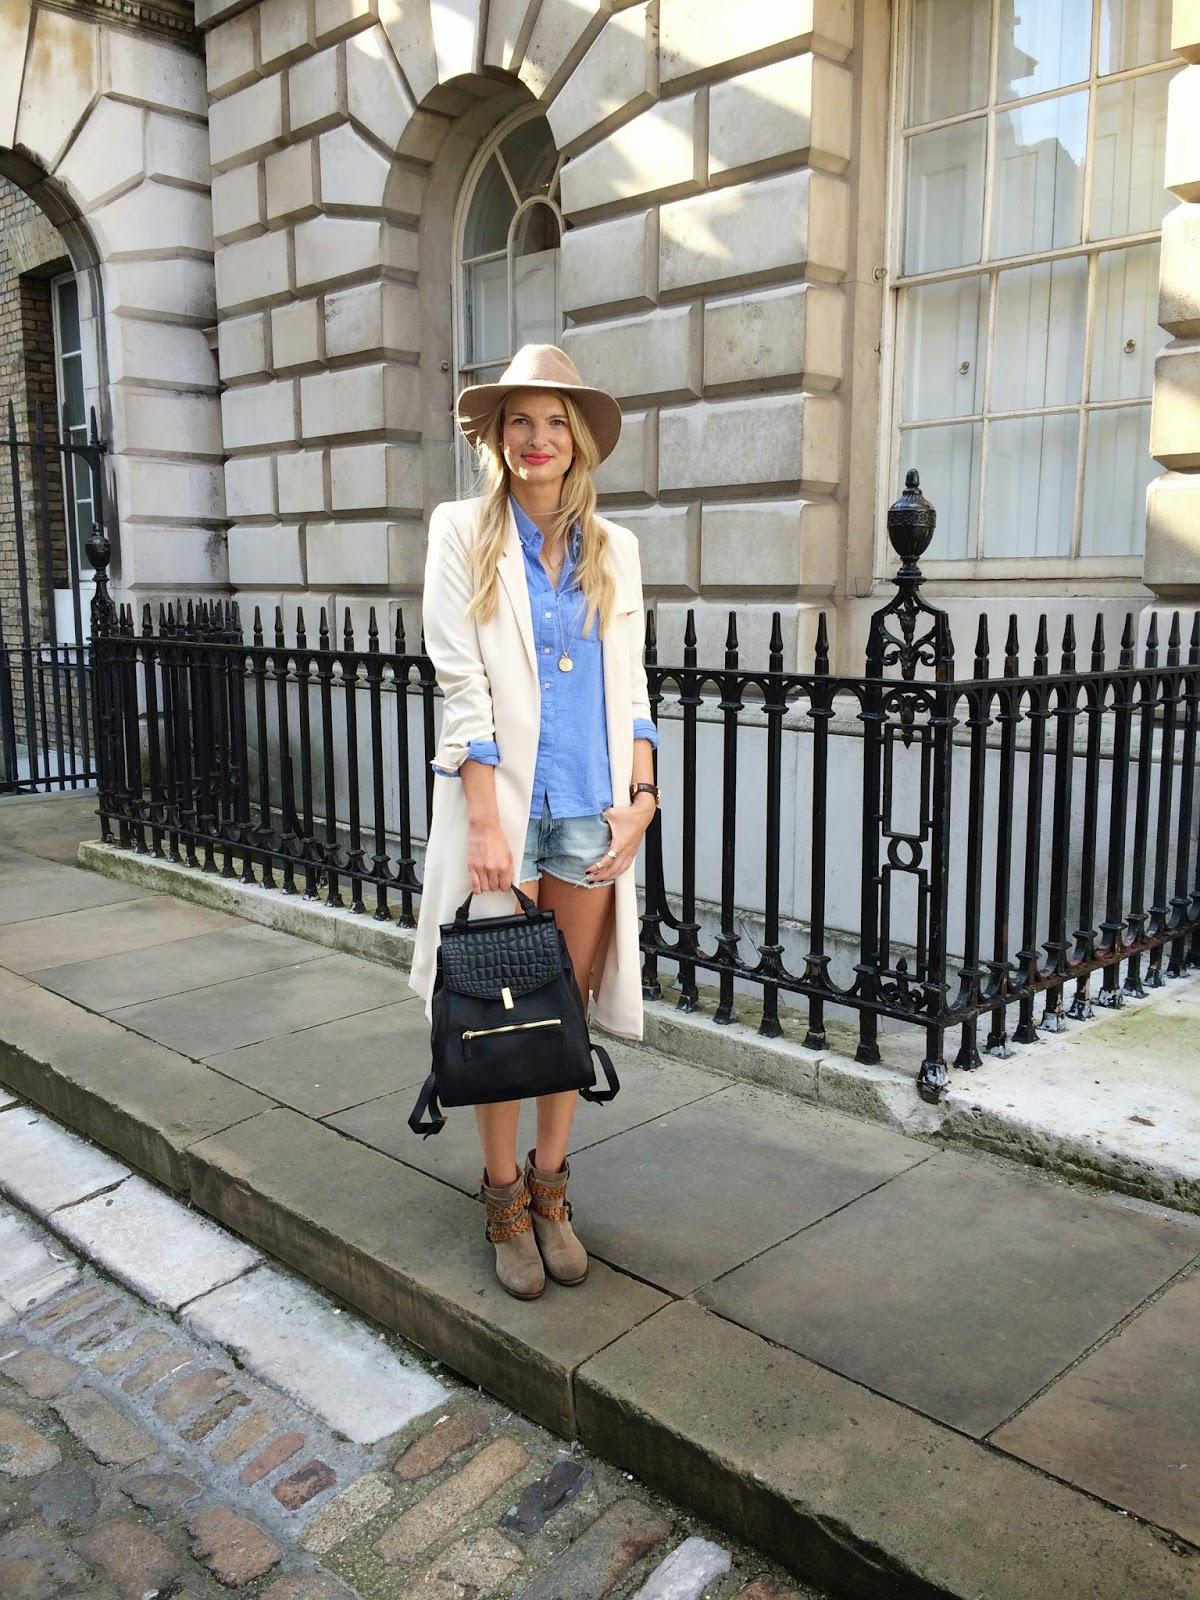 somerset house, street style, fashion blogger street style, street style, russell and bromley boots, black rucksack, camel hat, monica vinader